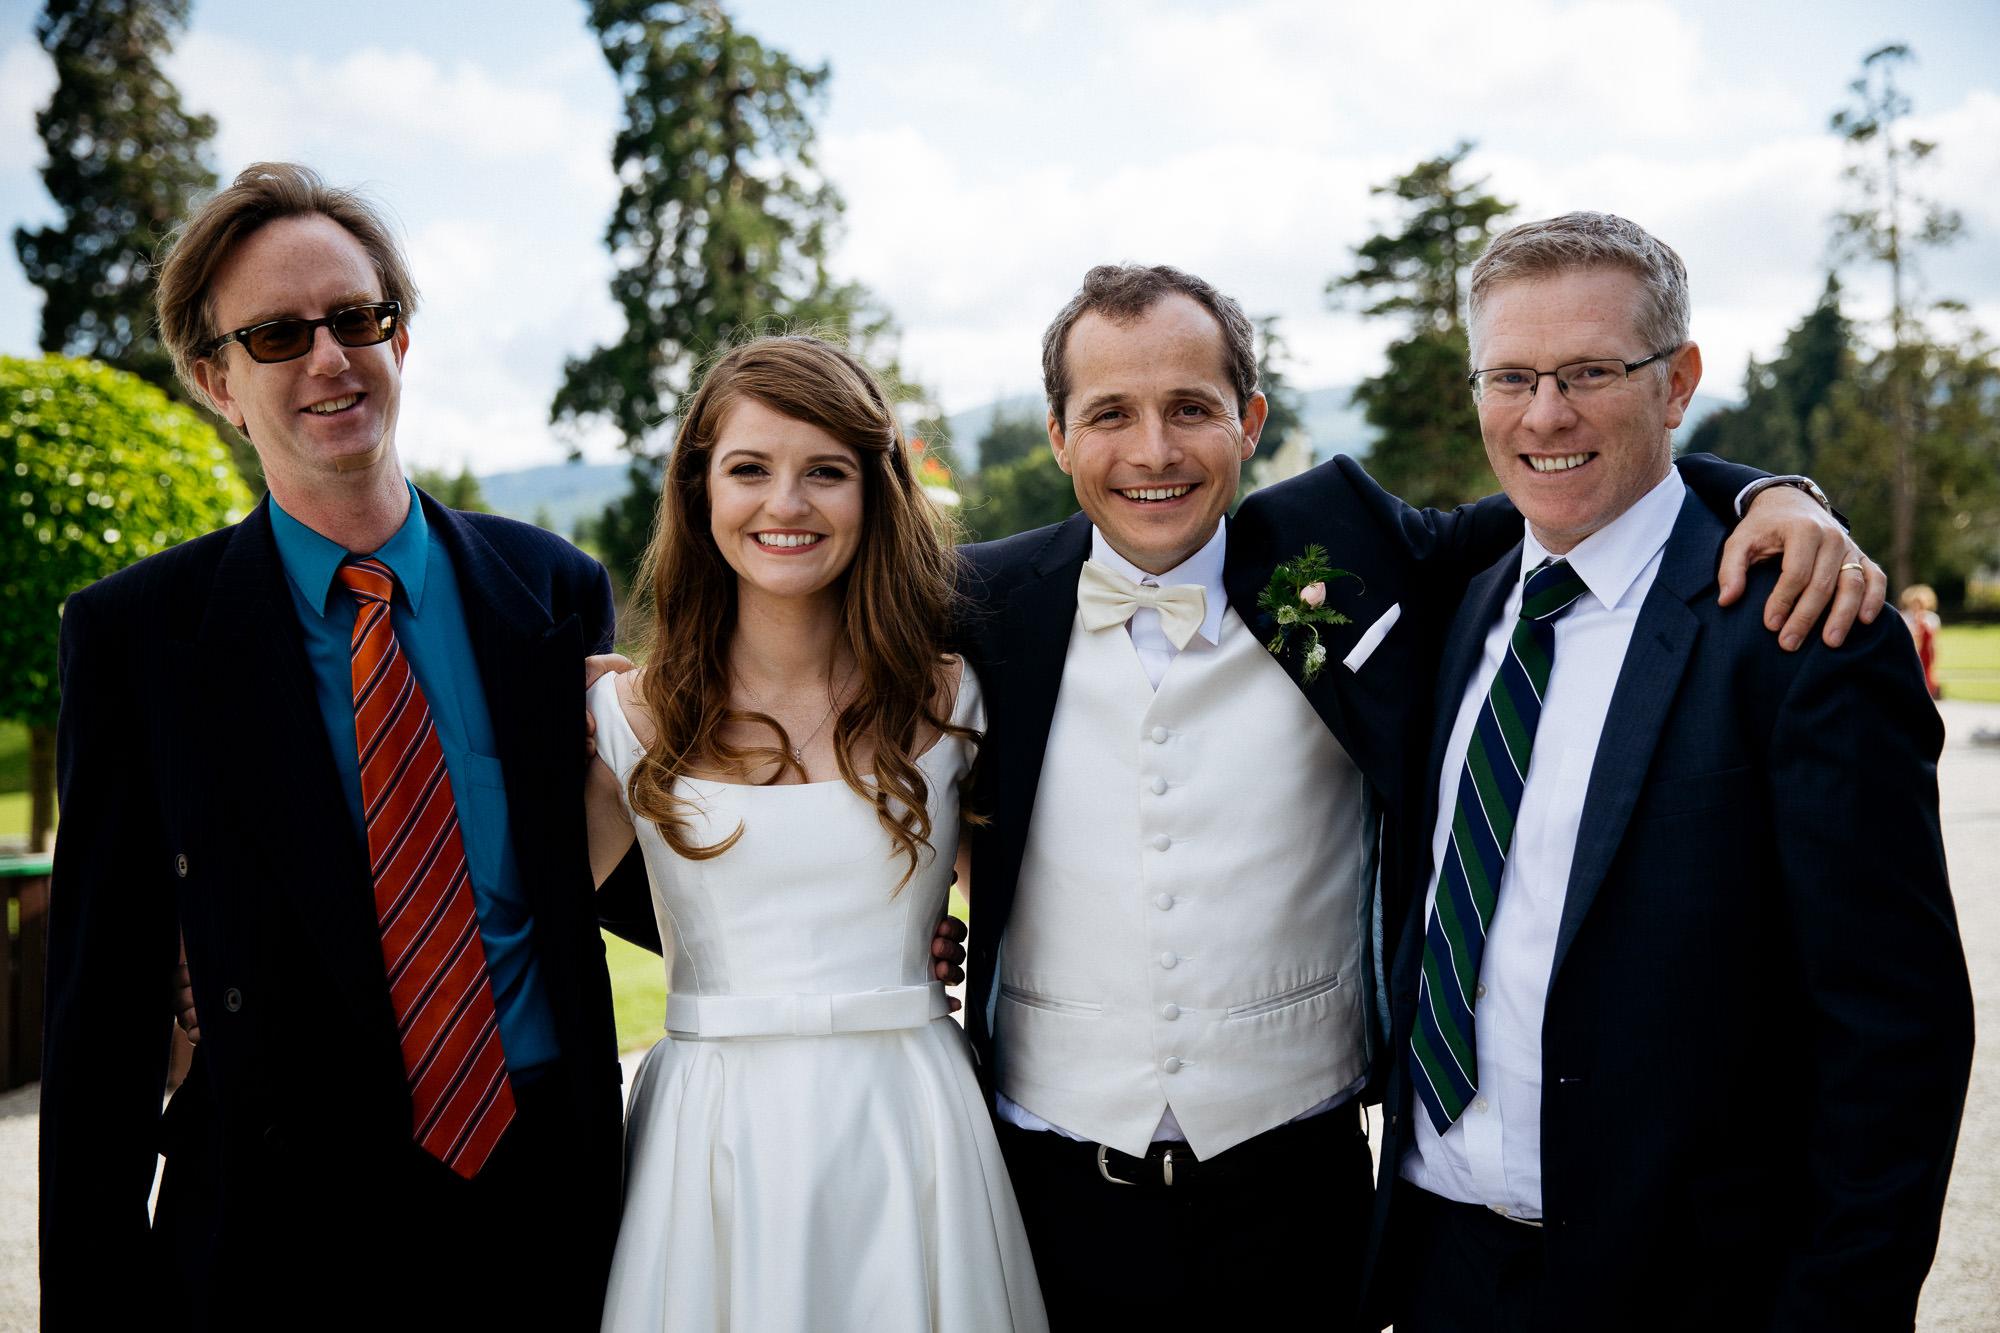 clairebyrnephotography-wedding-Emma-Max-26.jpg